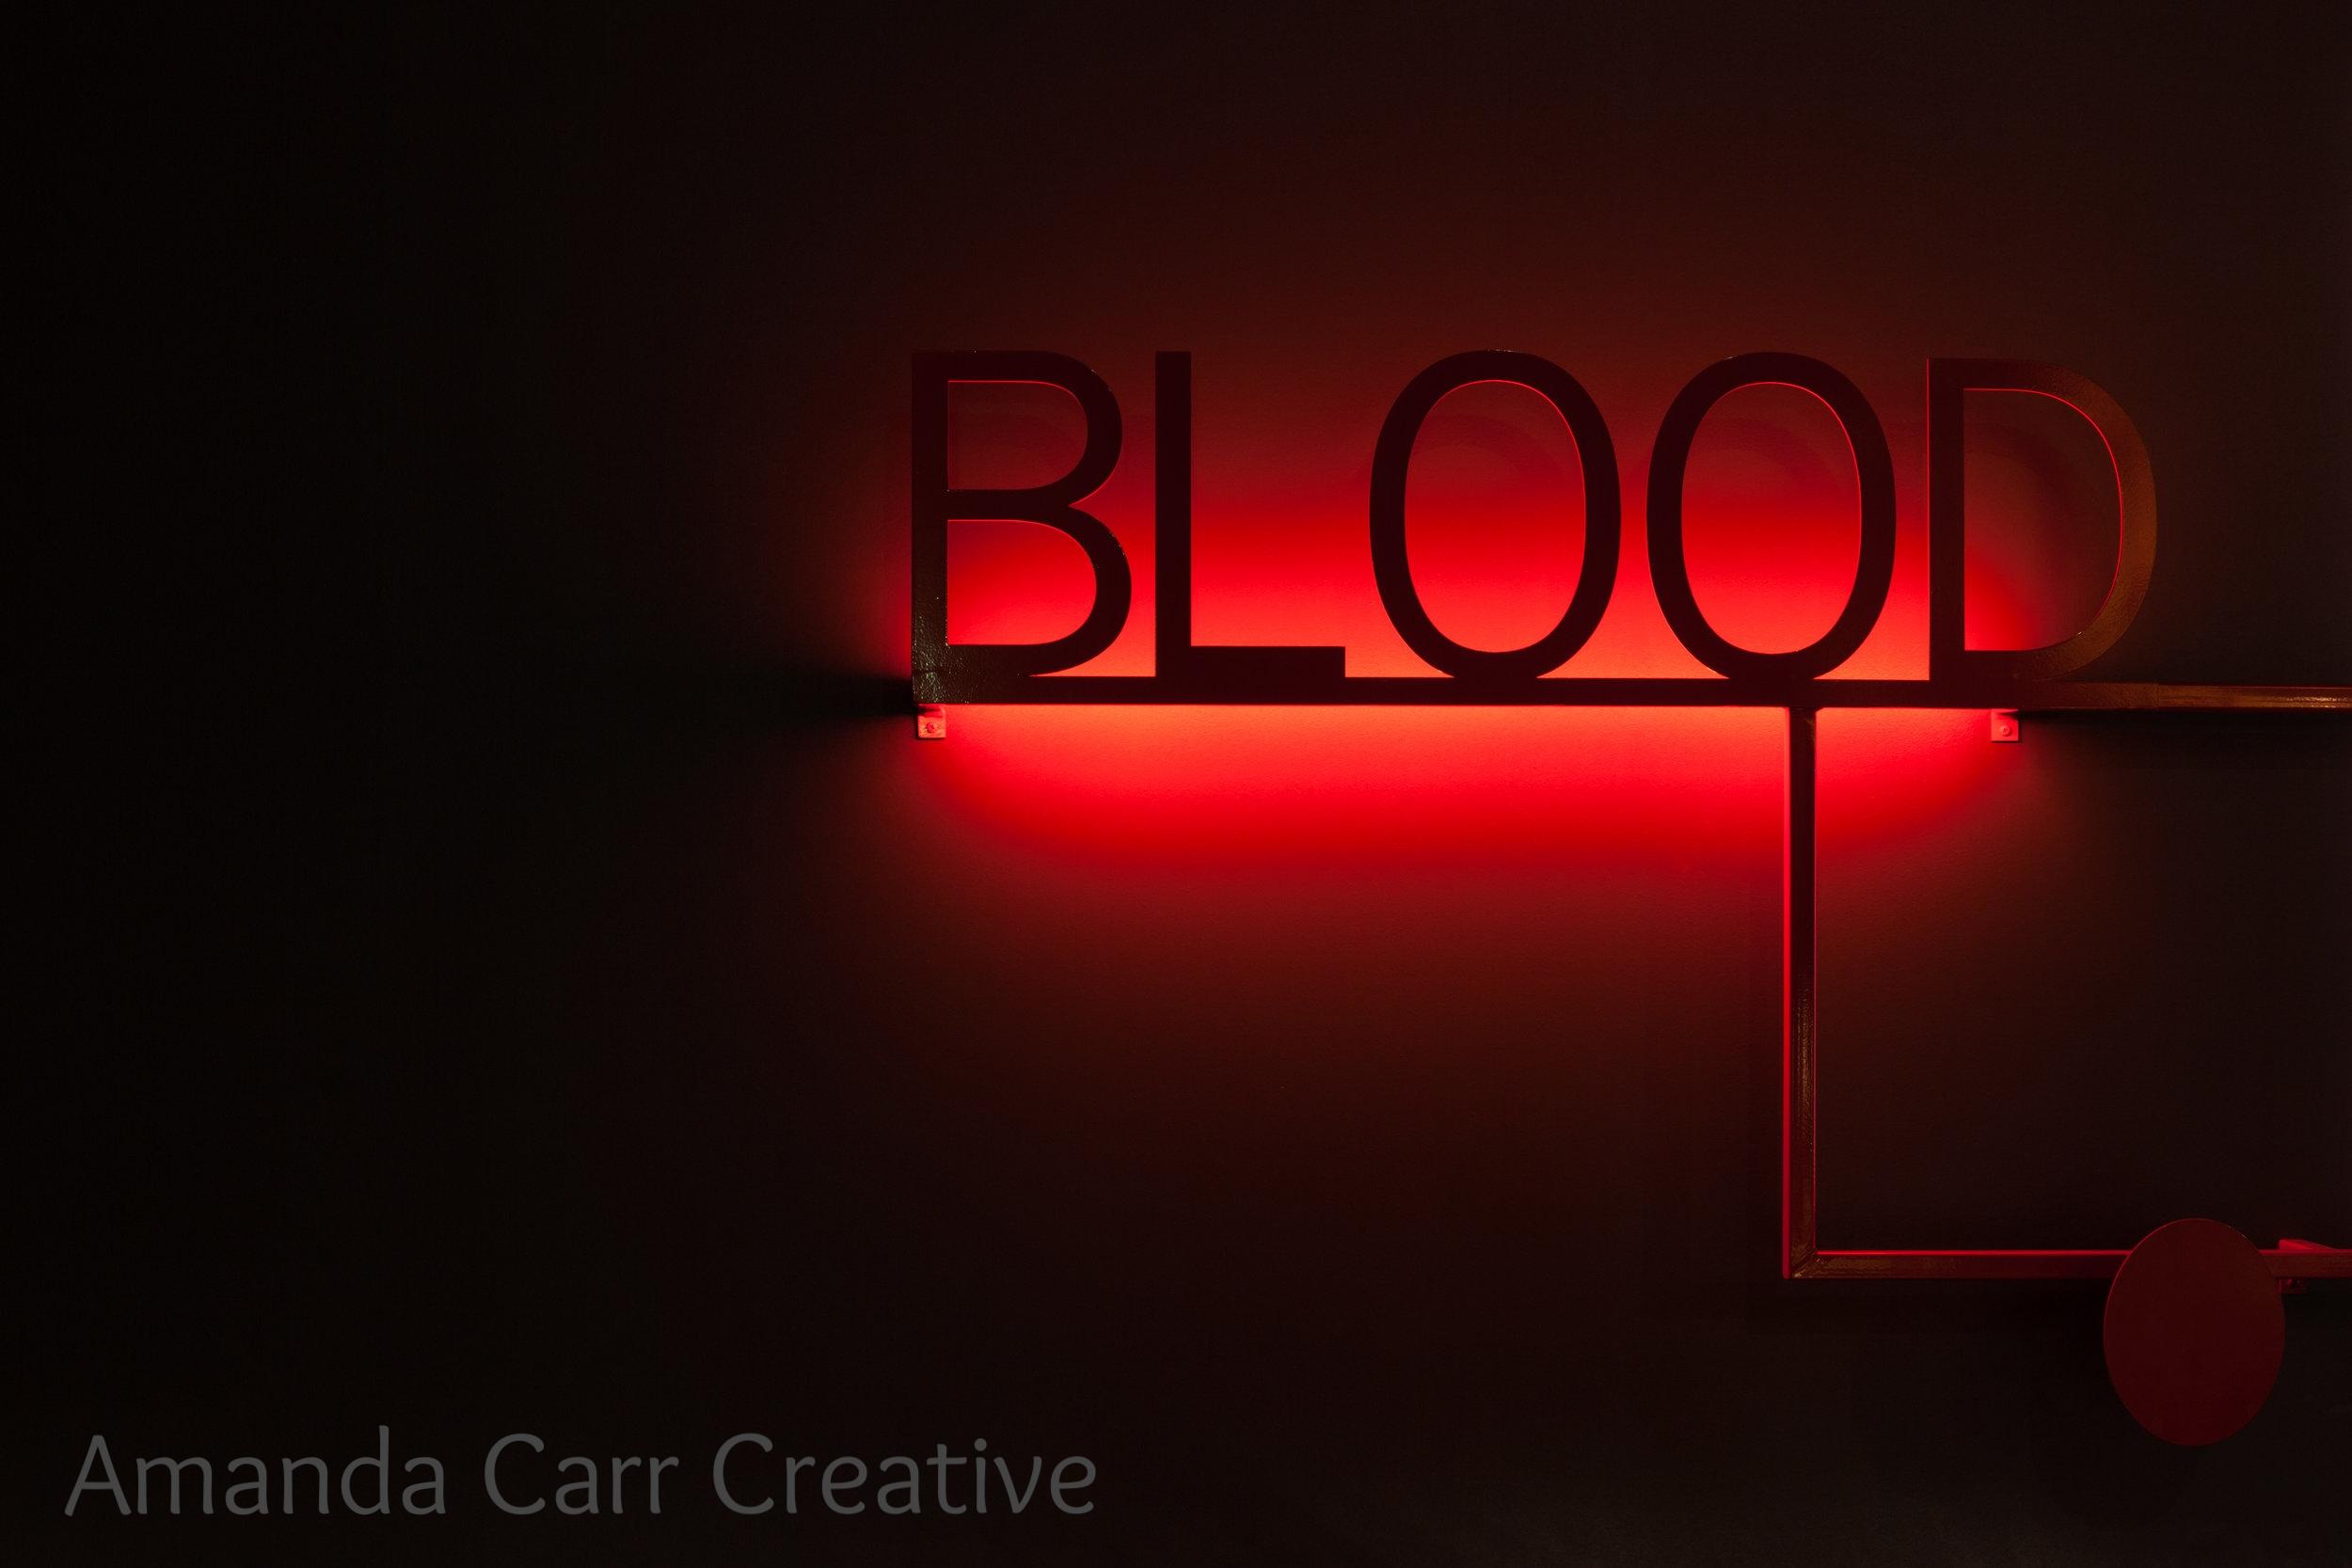 'Blood' @ University of Melbourne   Lighting Designer  NIklas Pajanti  http://www.niklaspajanti.com